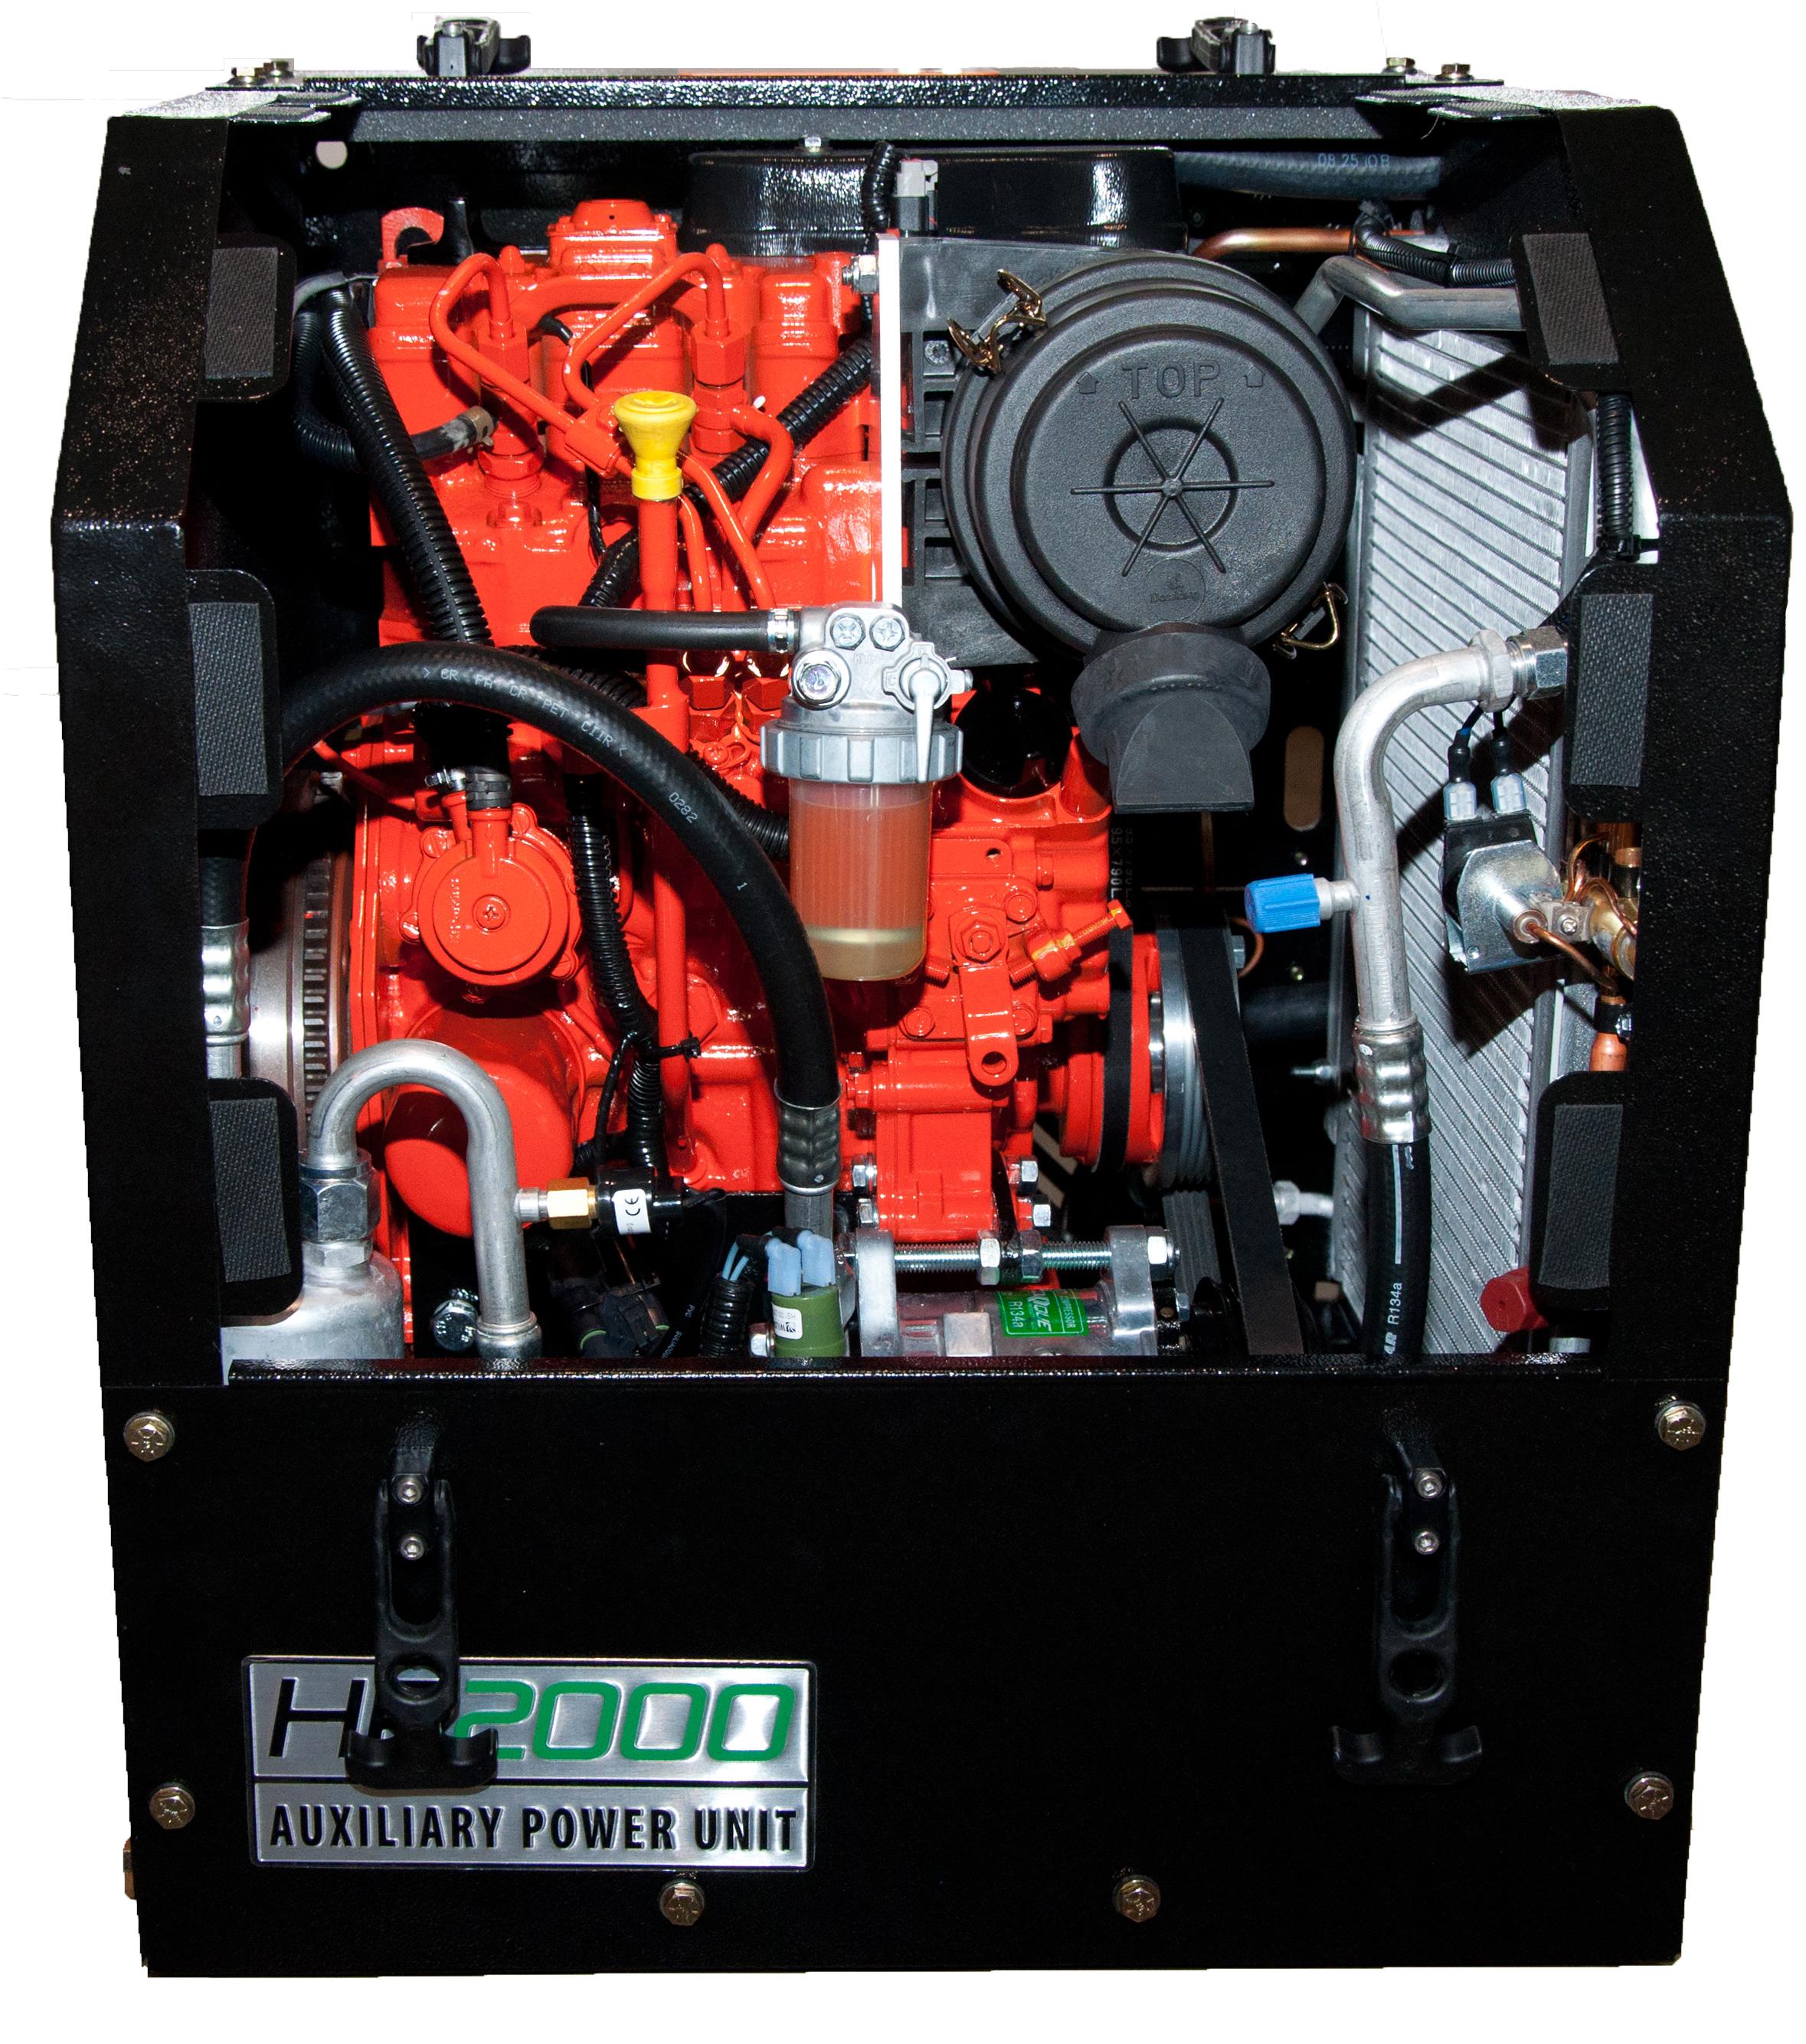 onan 6500 generator wiring diagram rigmaster generator wiring diagram rigmaster apu system truck apu truck generator ...